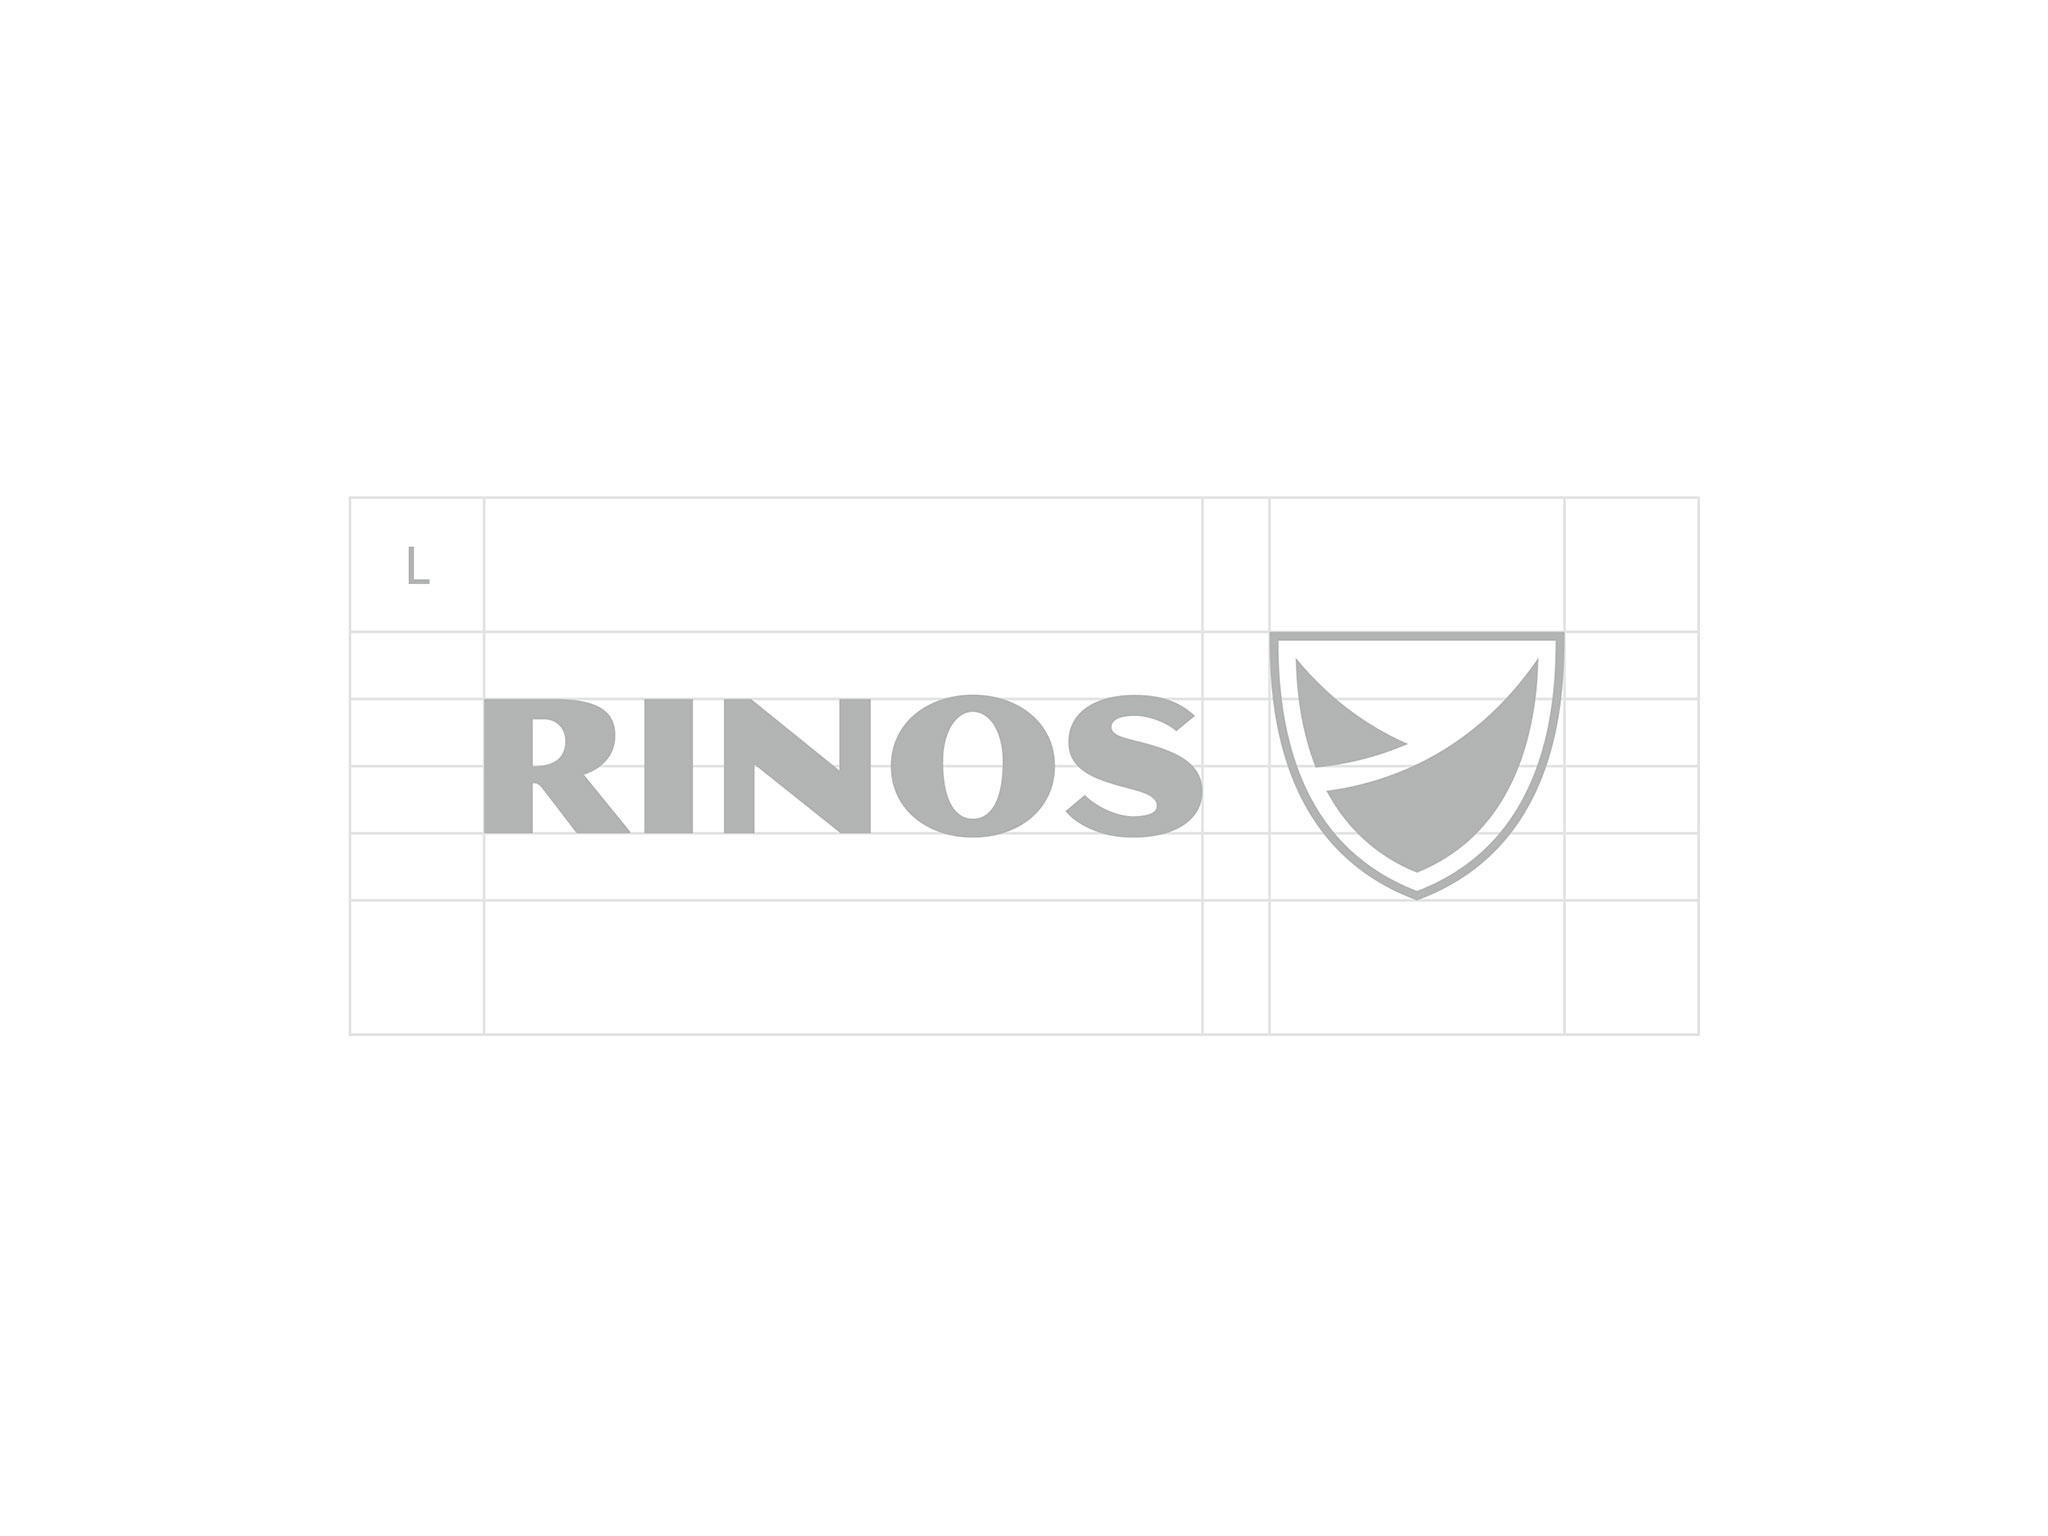 RINOS_LOGO_HL